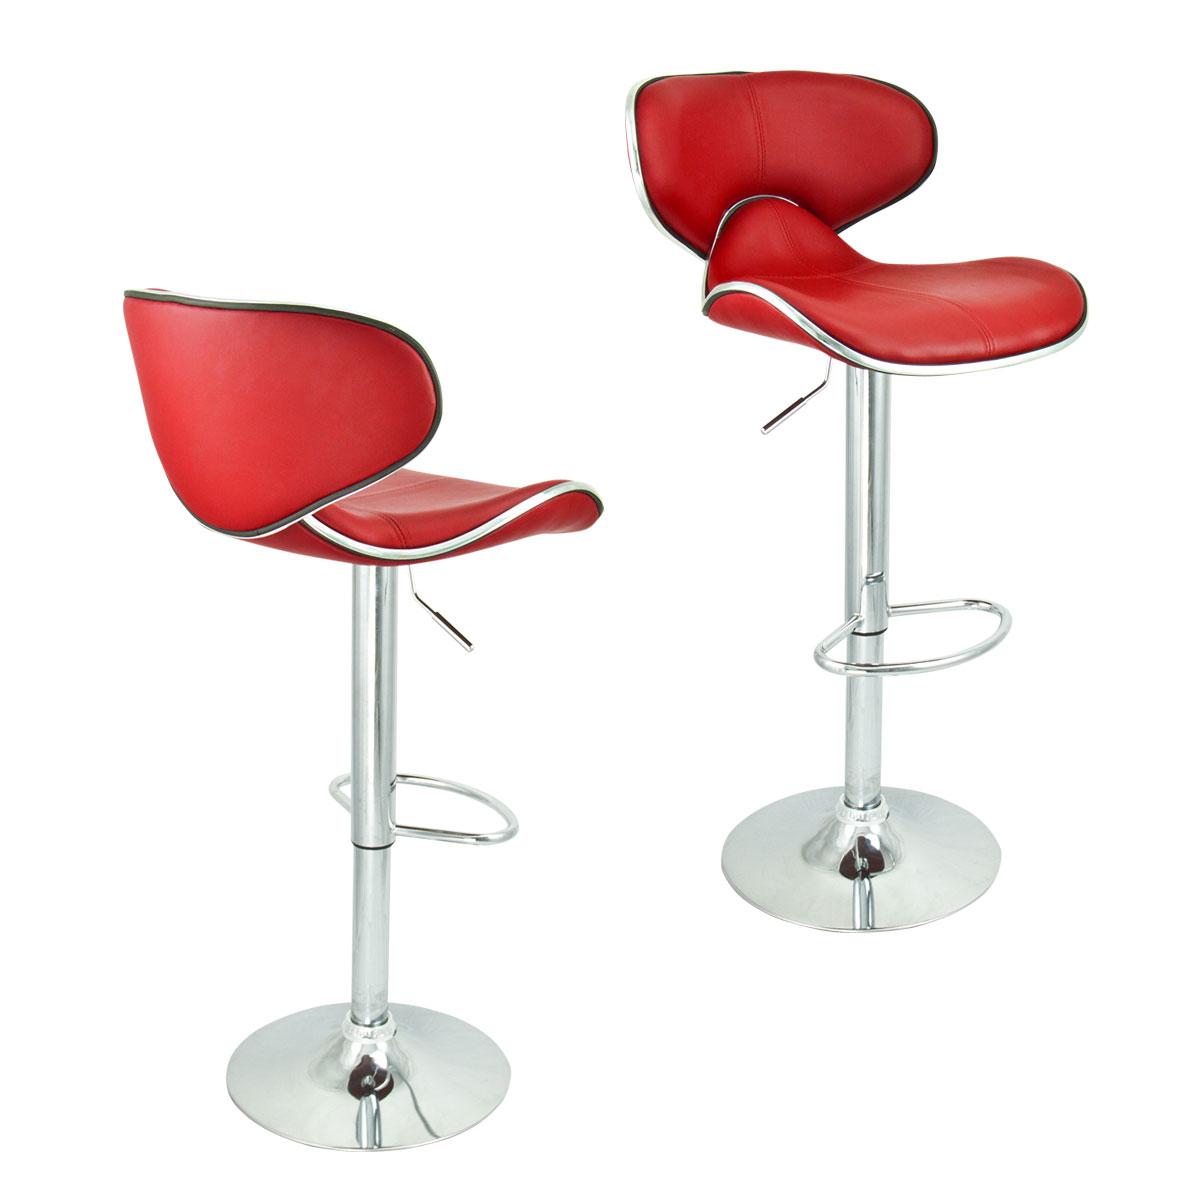 2 Swivel Red Bar Stool Elegant PU Leather Modern  : 37850ah from www.ebay.com size 1200 x 1200 jpeg 78kB